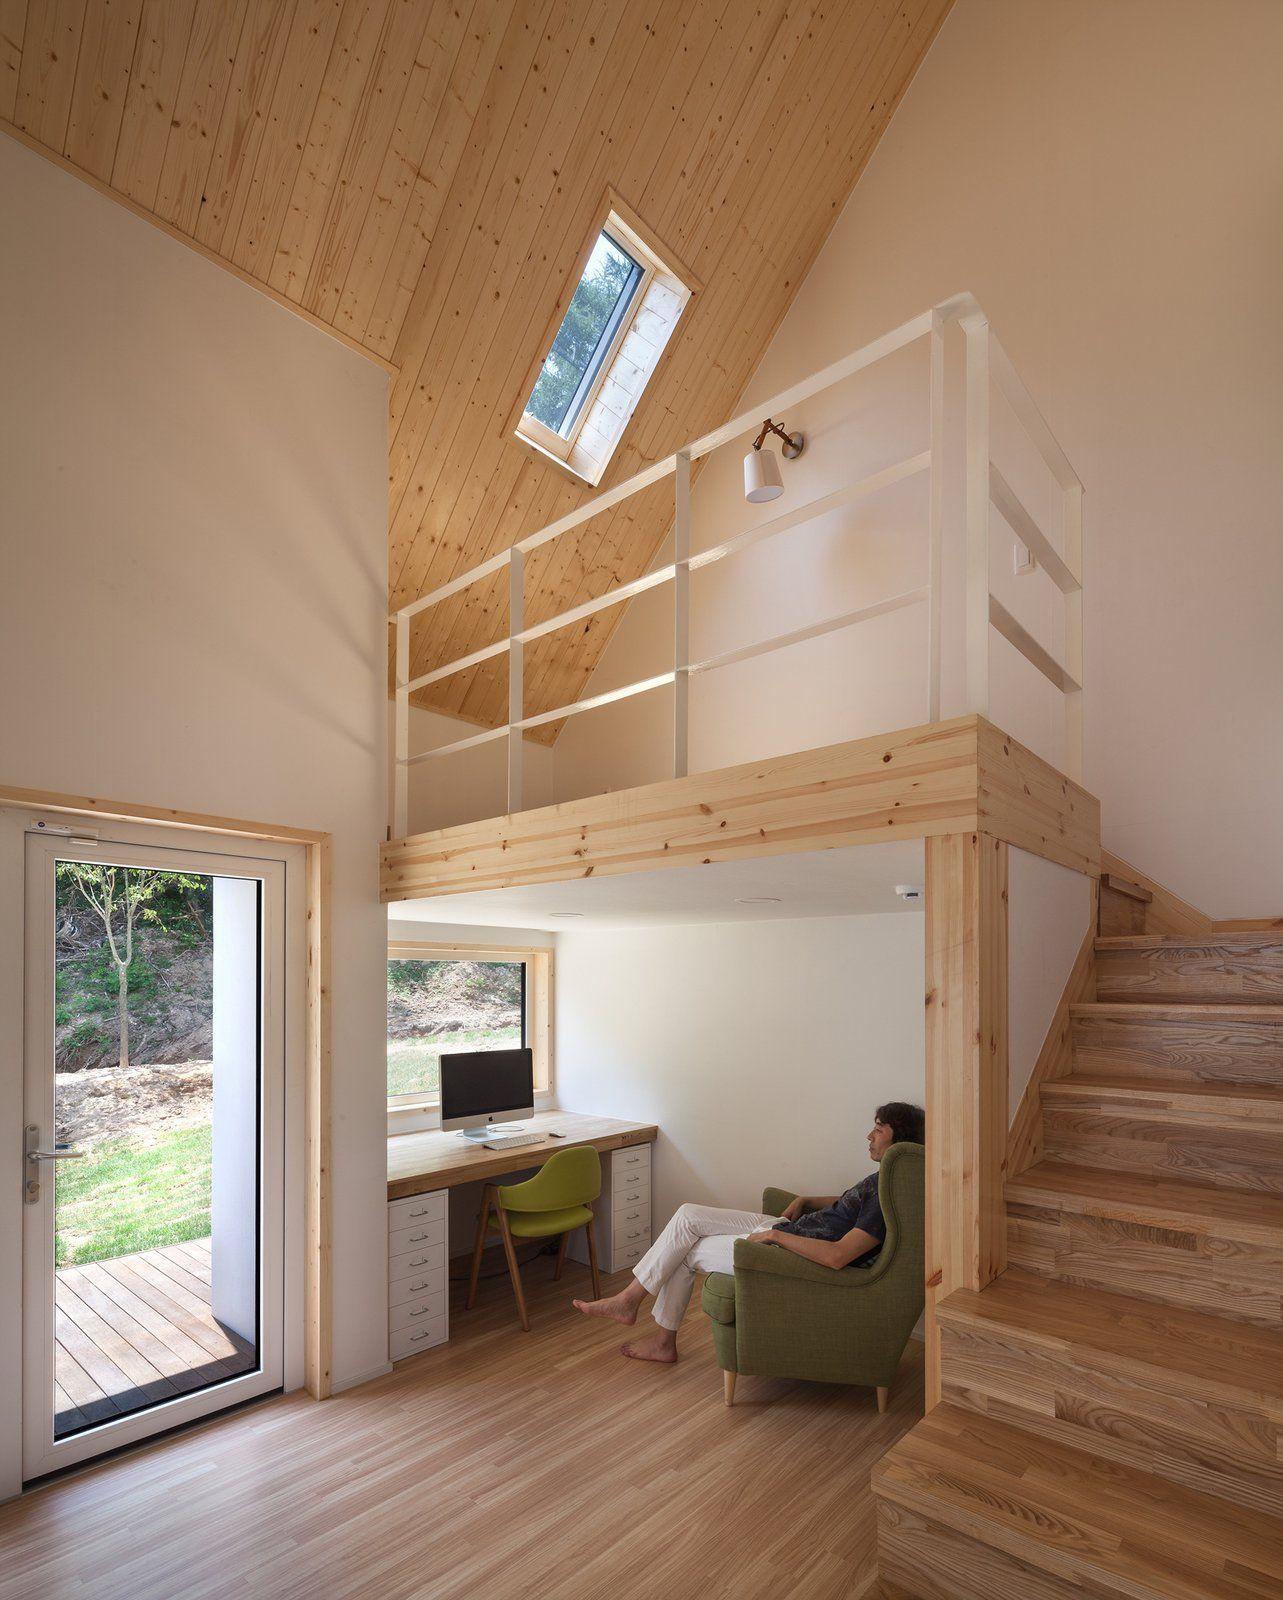 Photo 5 Of 14 In Nature Engulfs This South Korean House Nestled Into Wood Floor Design Floor Design House #raised #platform #living #room